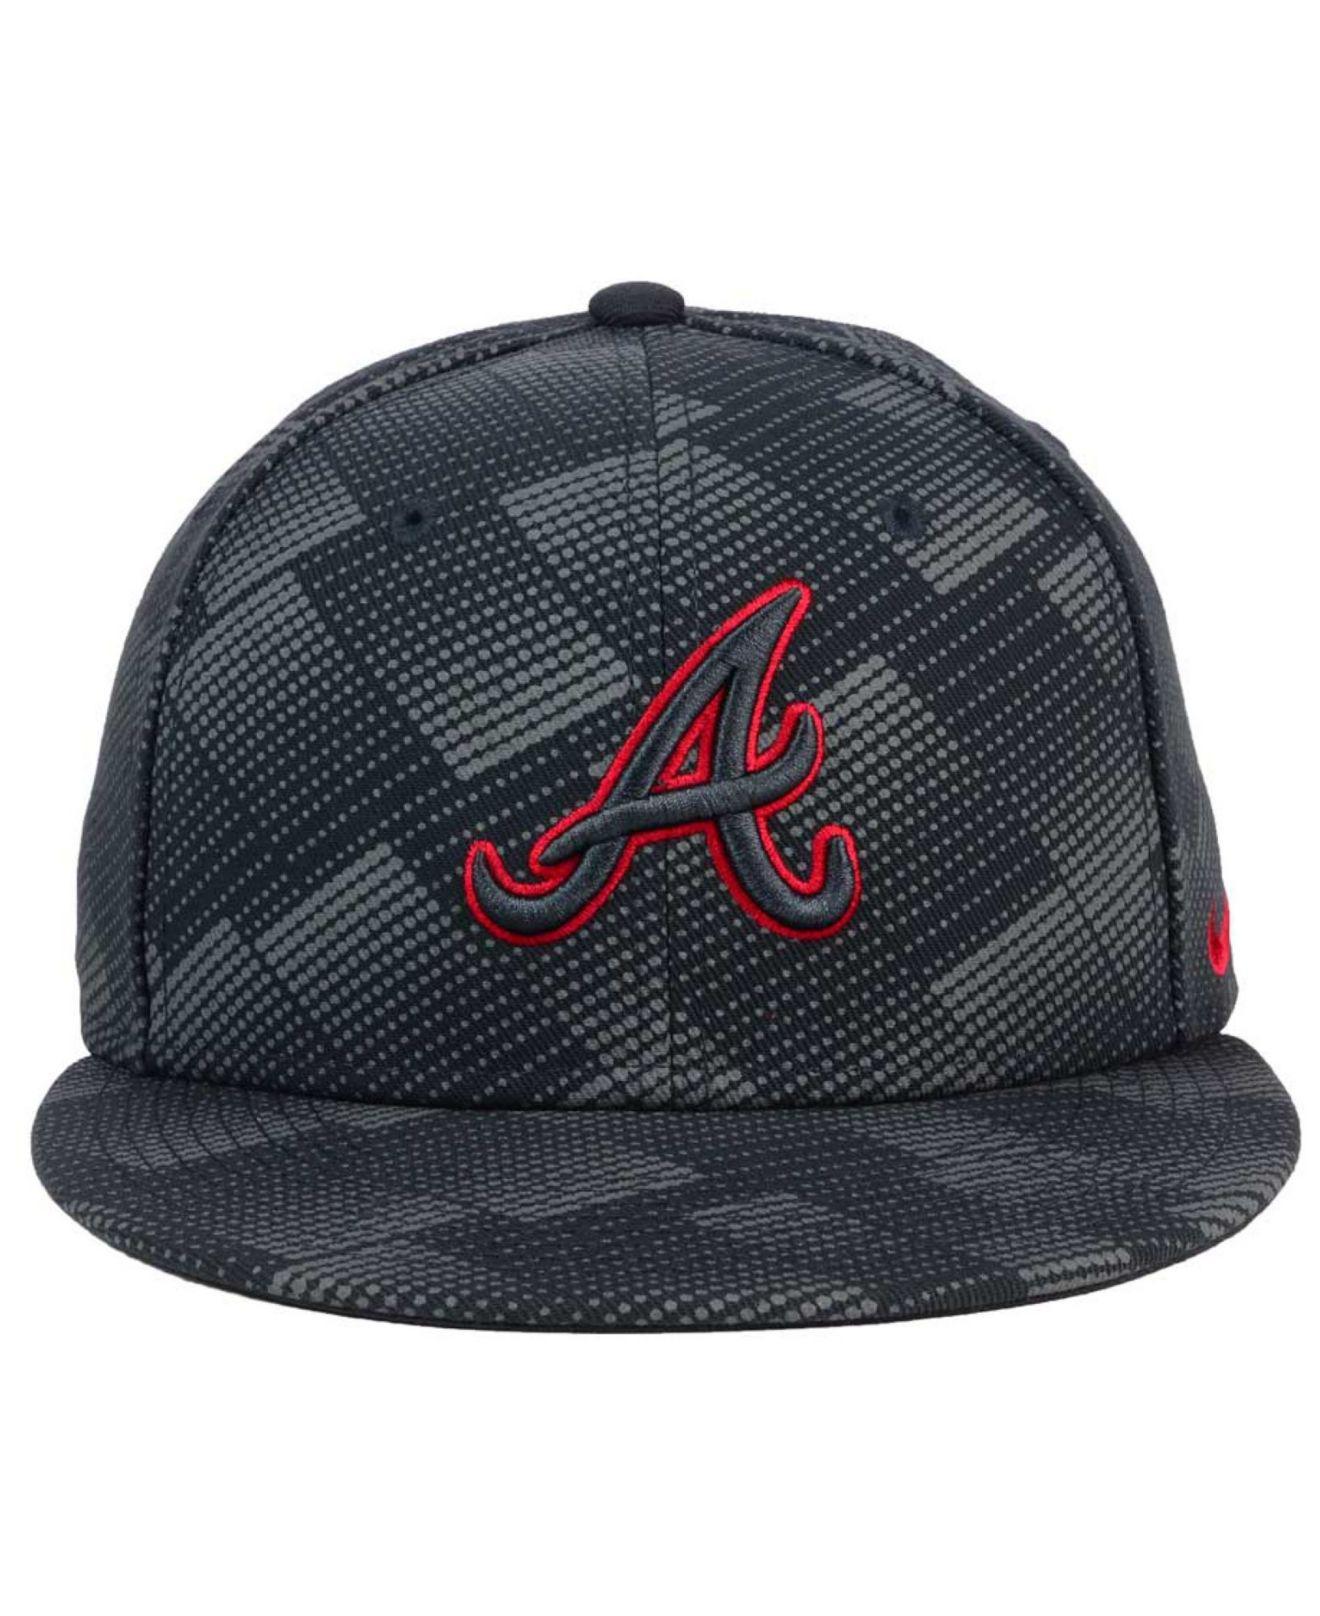 dd63beaa ... where can i buy lyst nike atlanta braves anthracite snapback cap for  men 700ab 17e9a